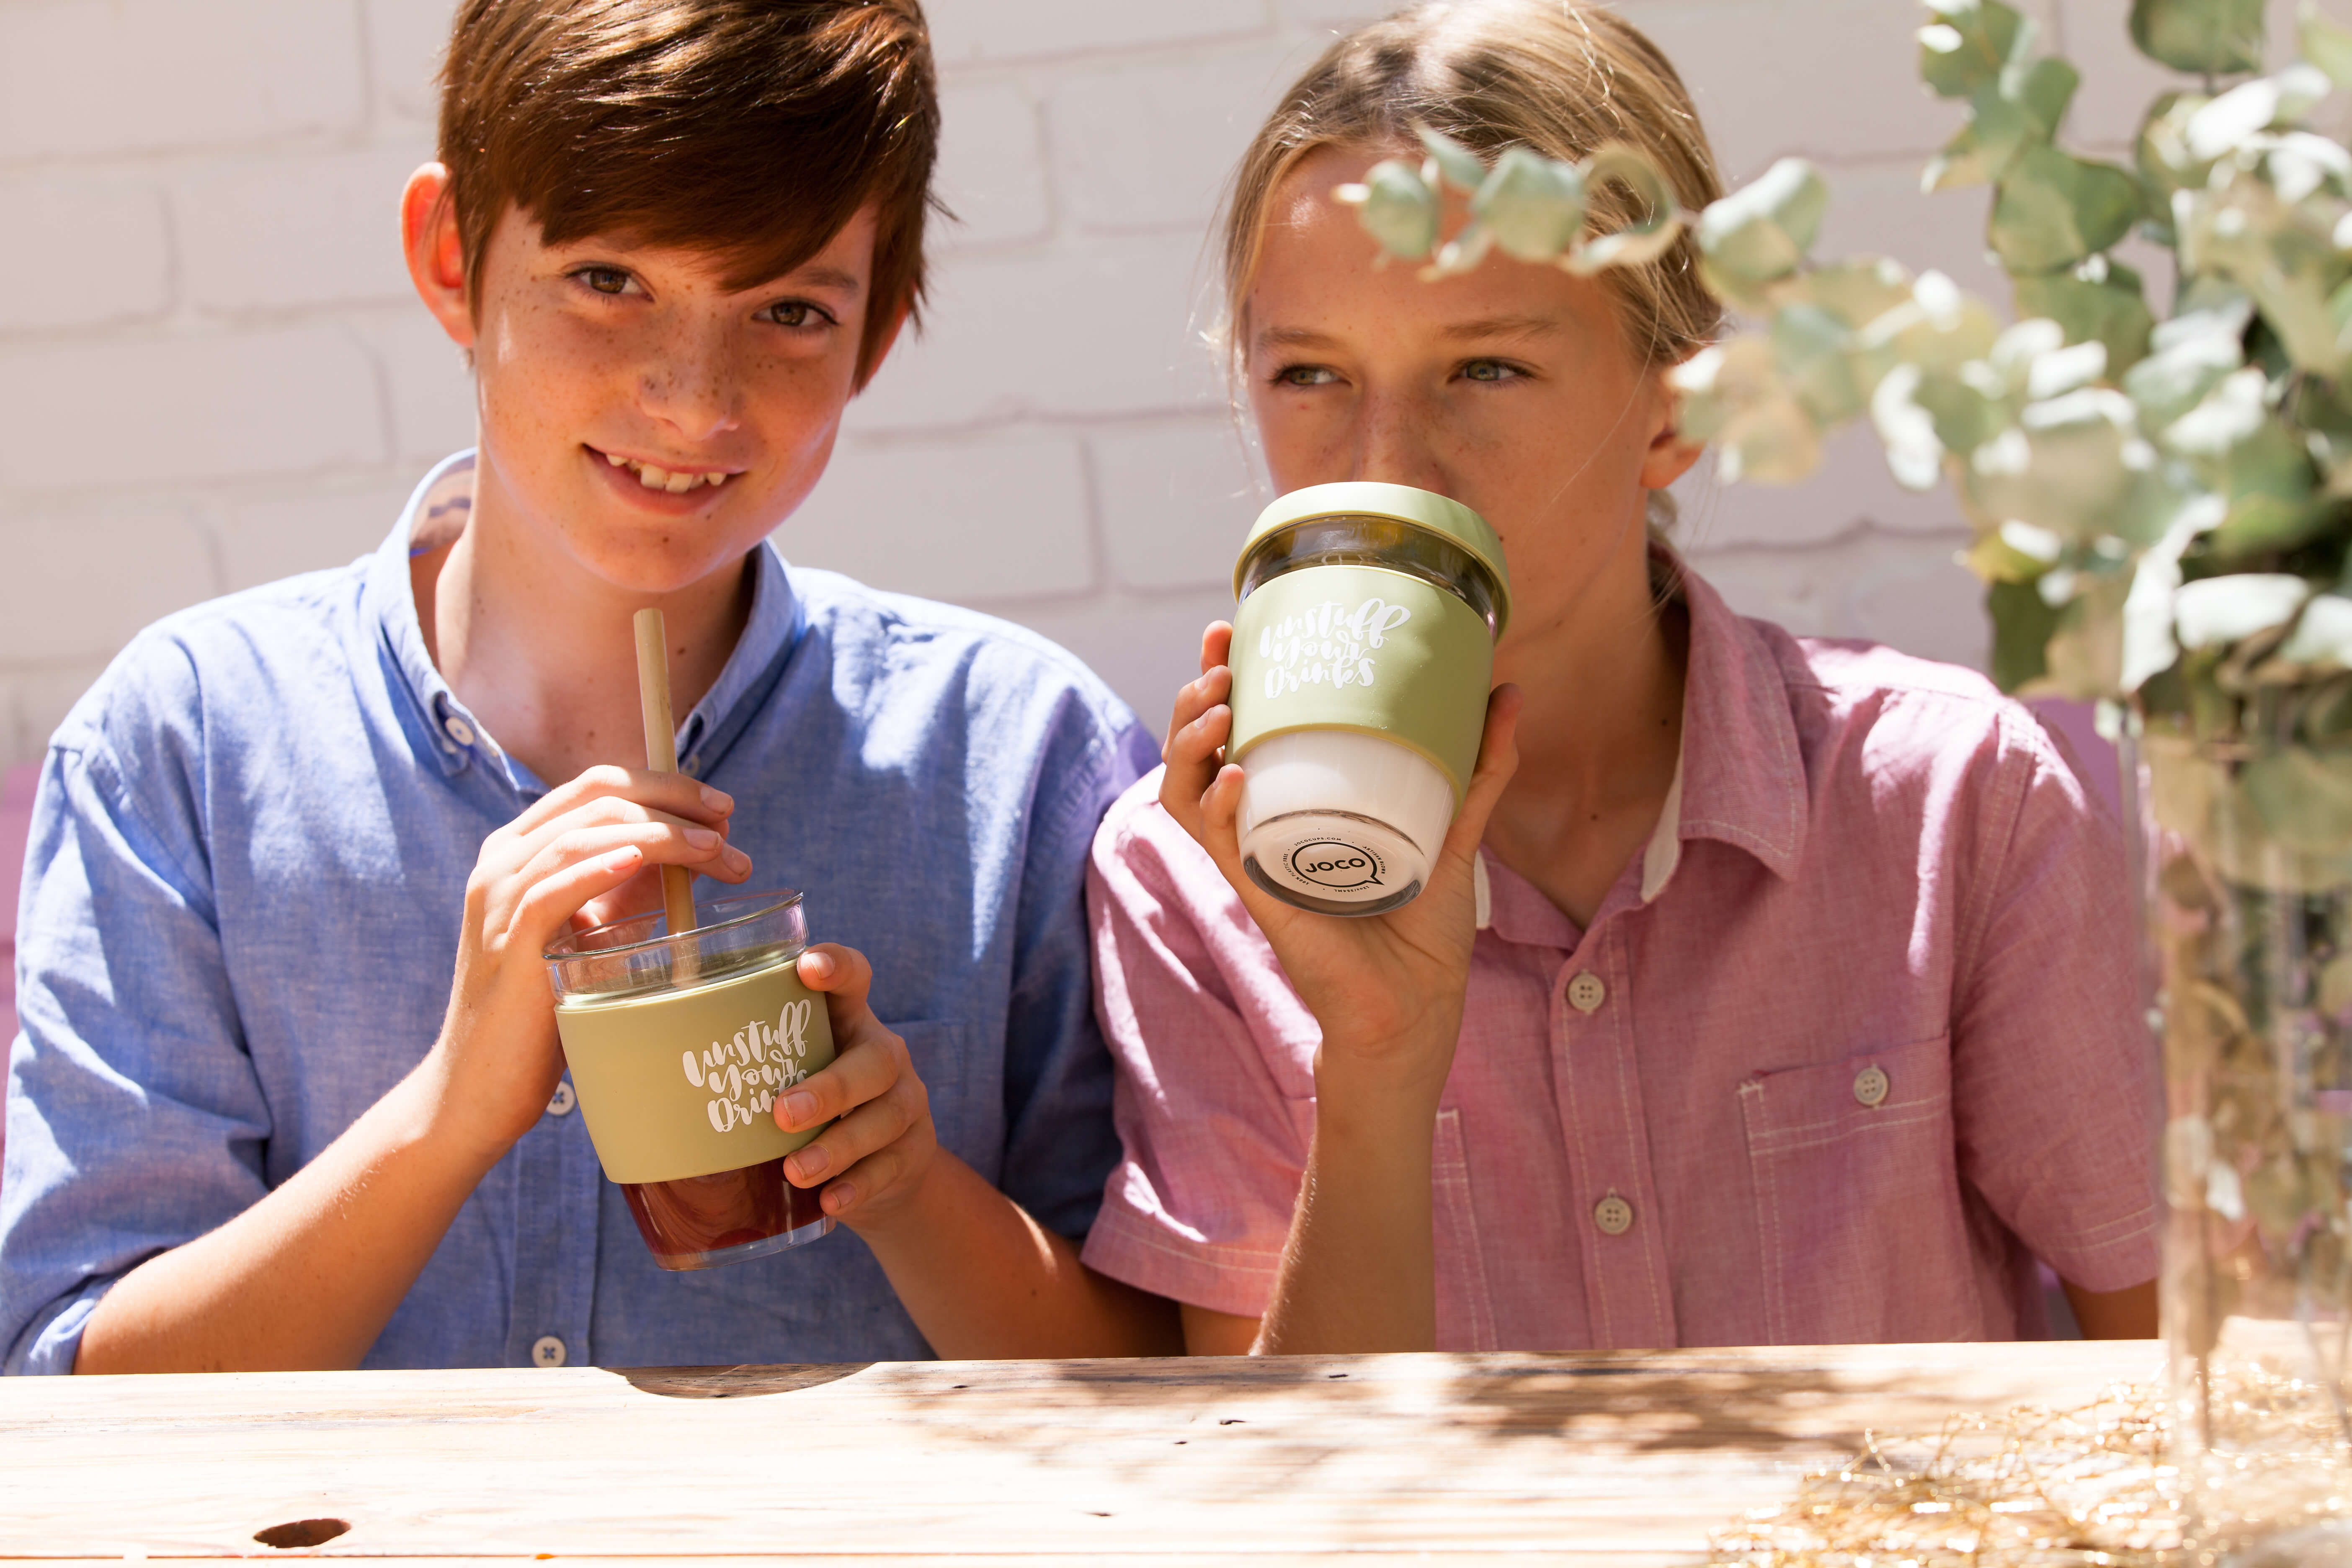 Joco Glass Zero Waste Custom Cup Keepcup Tea Coffee Reusable Cup Nowhere & Everywhere Zero Waste Kits Australia New Zealand UK America United States Ireland Europe